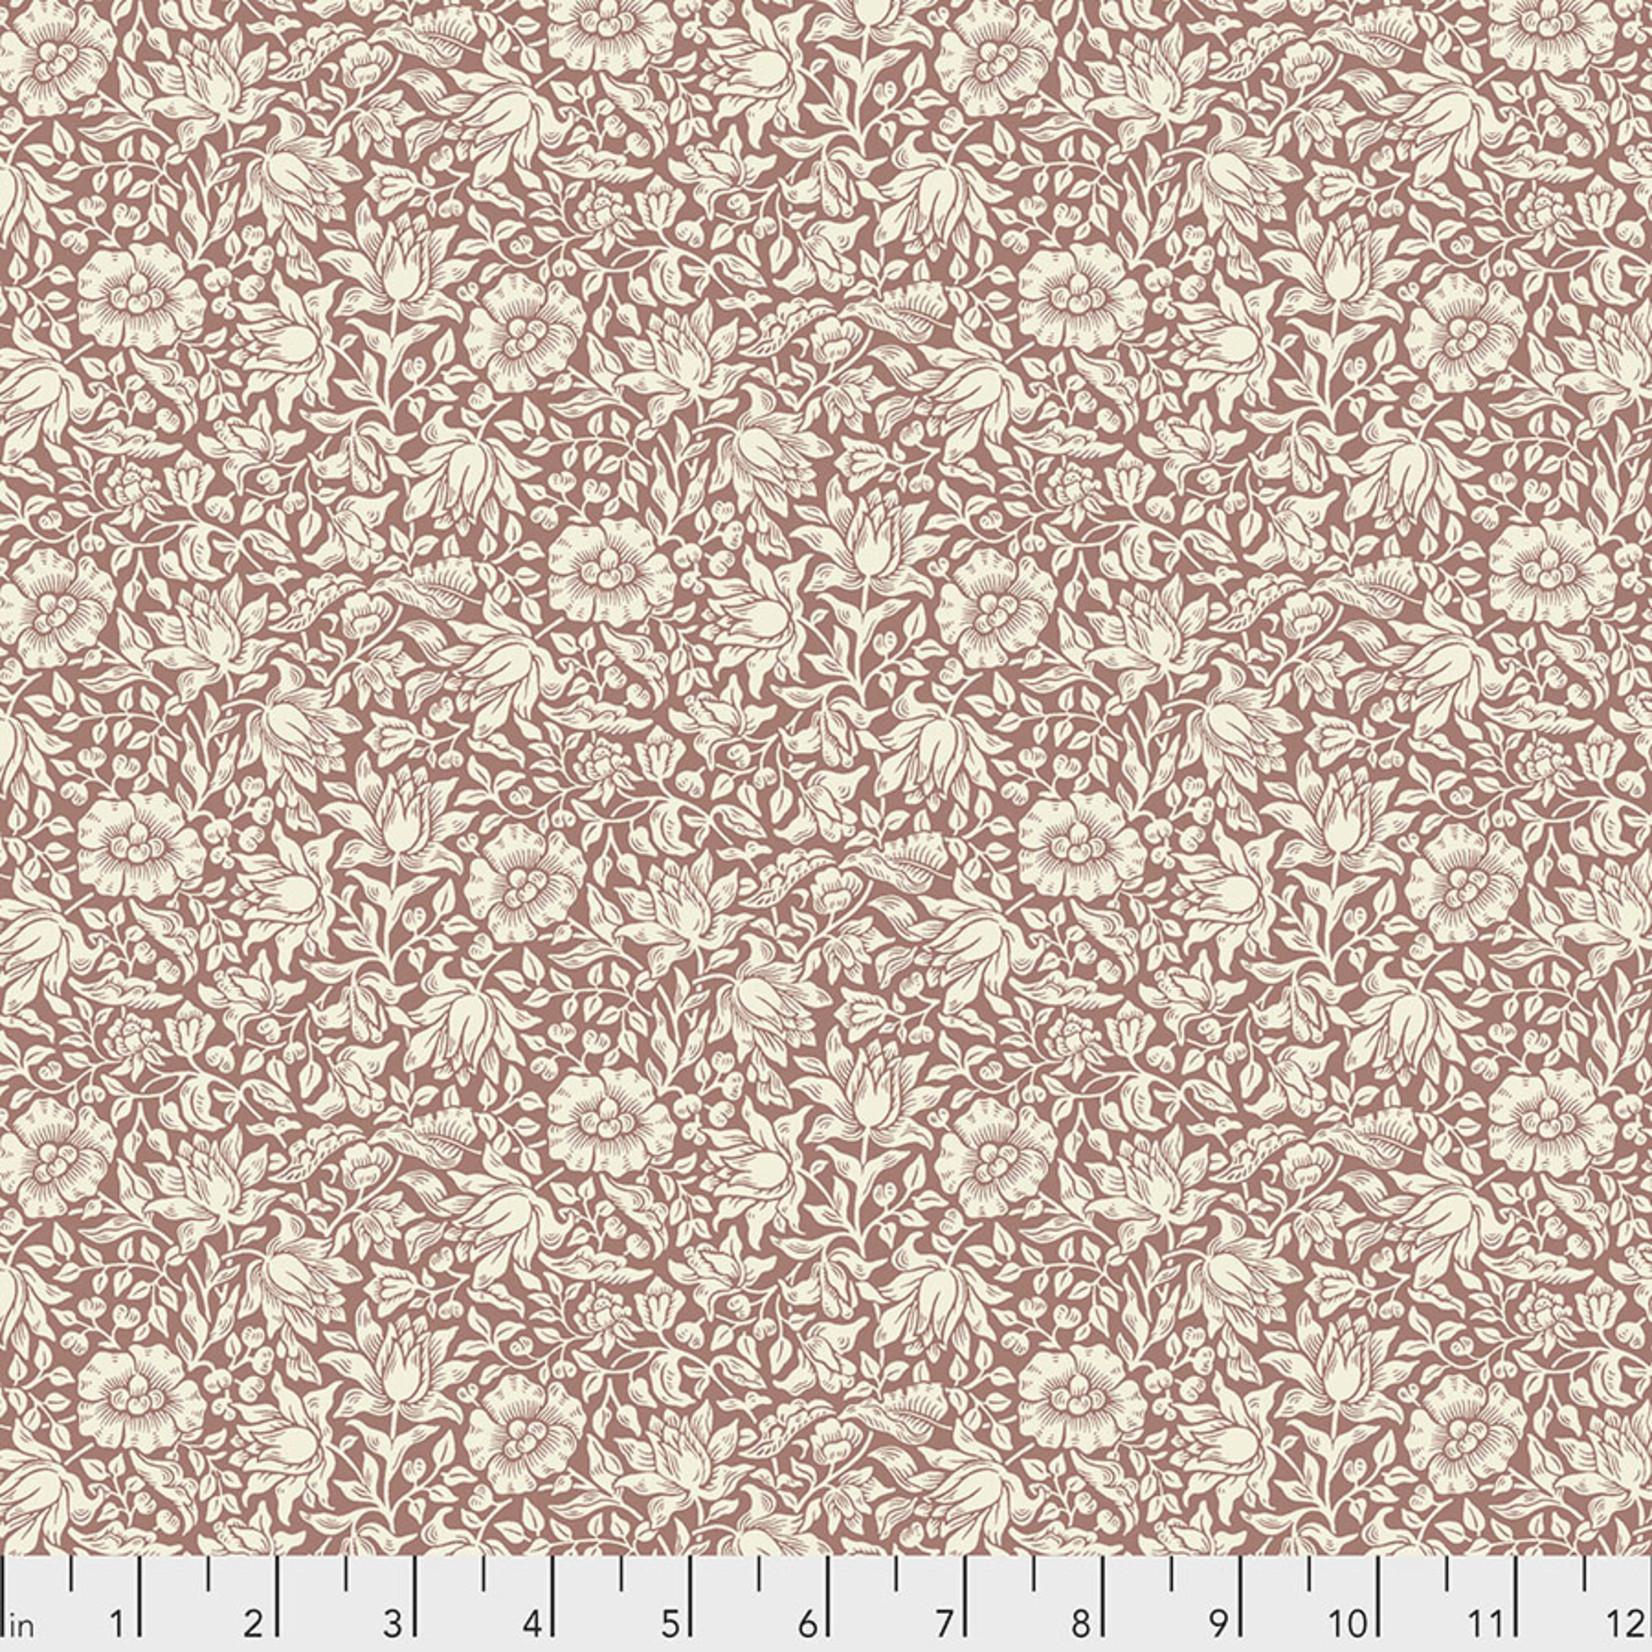 Morris & Co Orkney, Mallow - Rose (PWWM048) per cm or $16/m